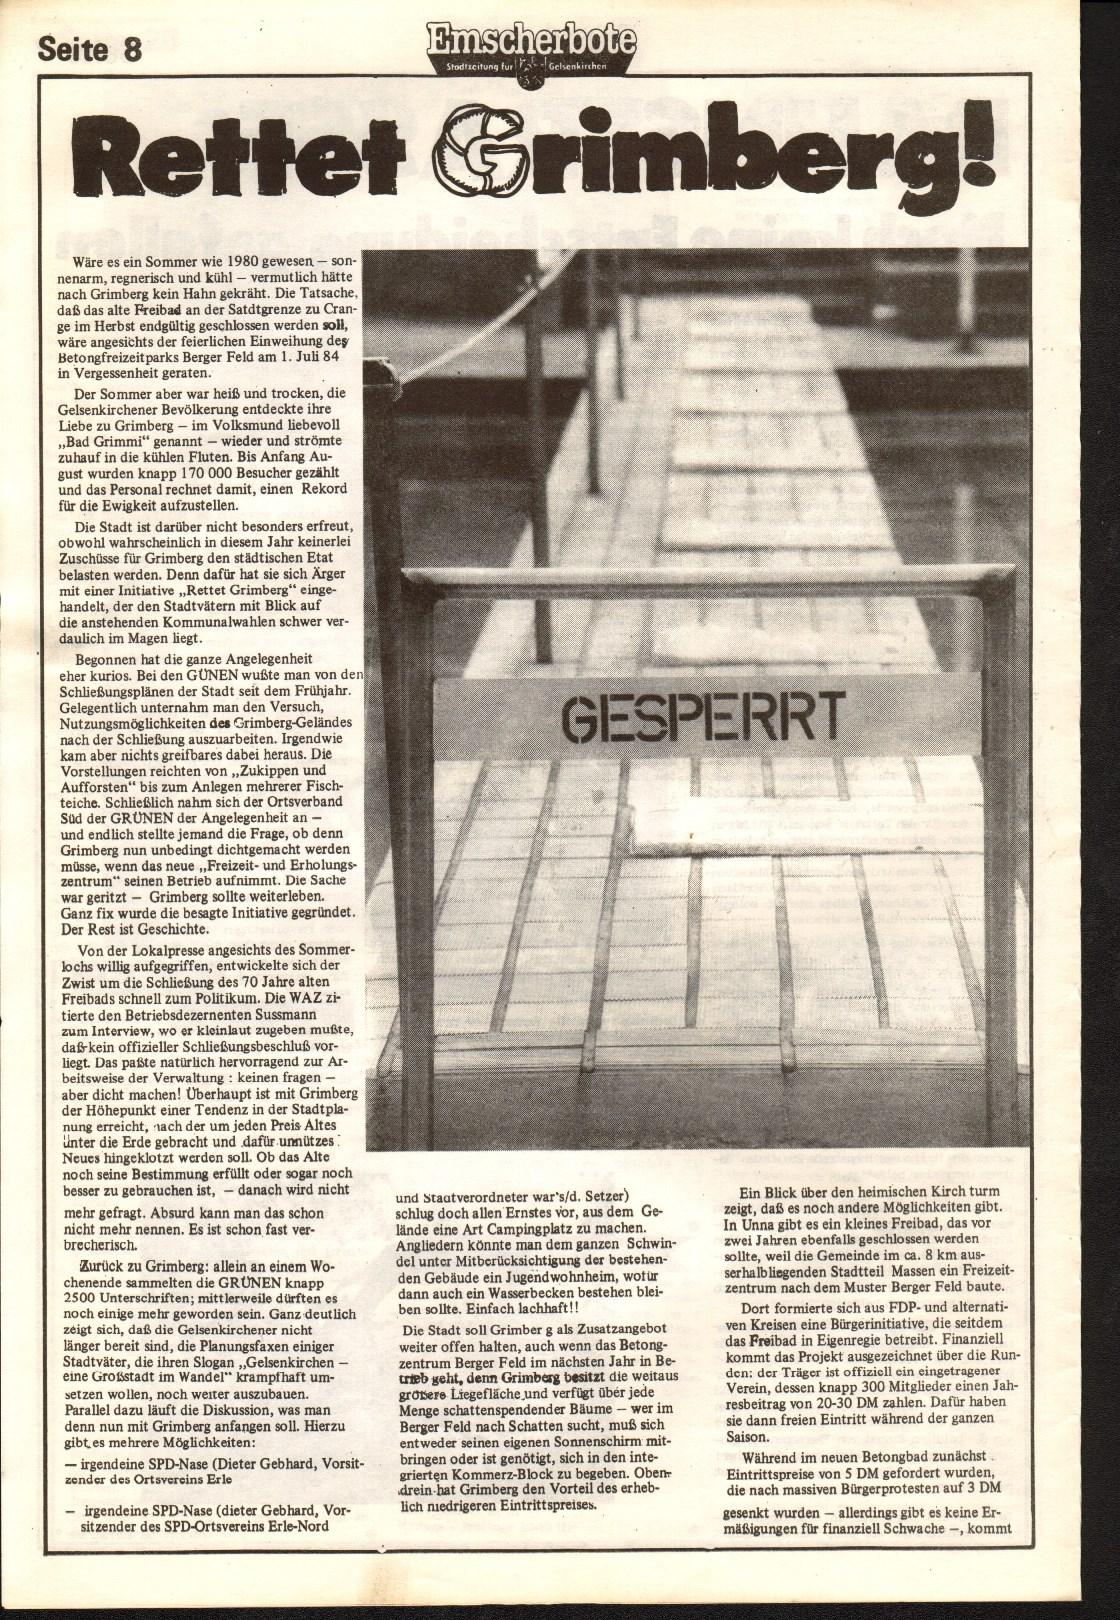 Gelsenkirchen_Emscherbote_1983_31_08